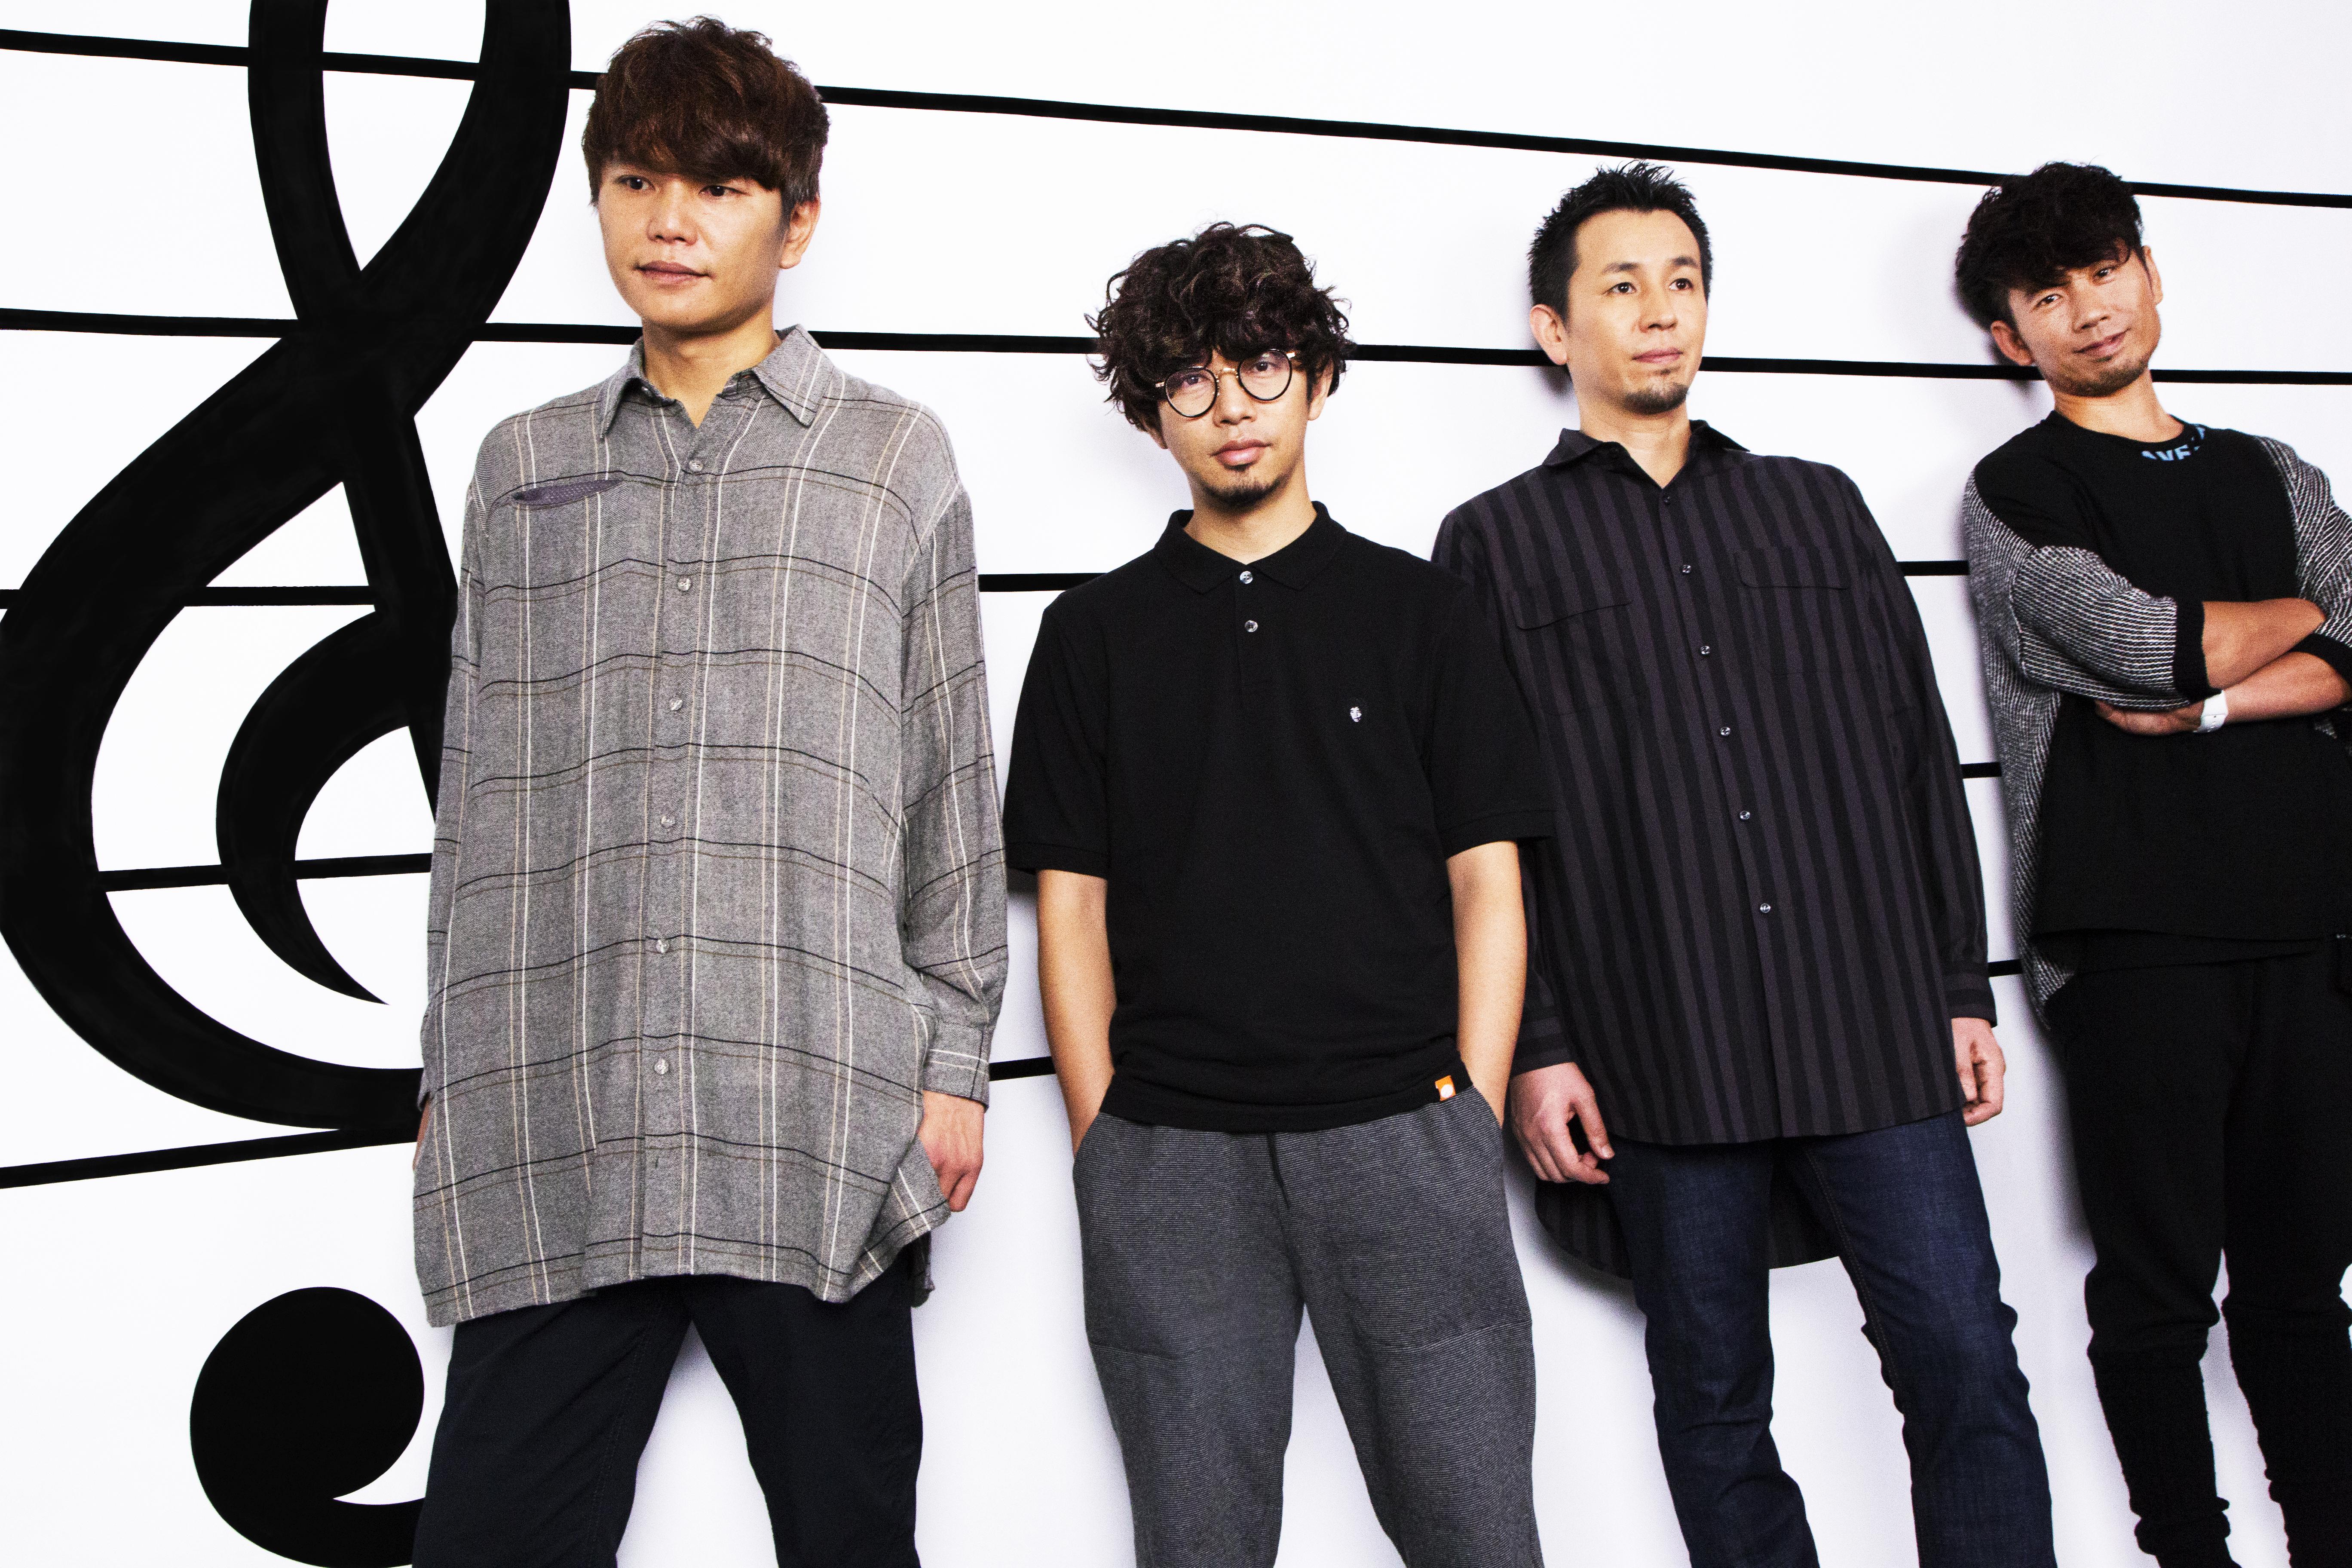 L→R 喜多建介(Gu&Vo)、後藤正文(Vo&Gu)、山田貴洋(Ba&Vo)、伊地知 潔(Dr)